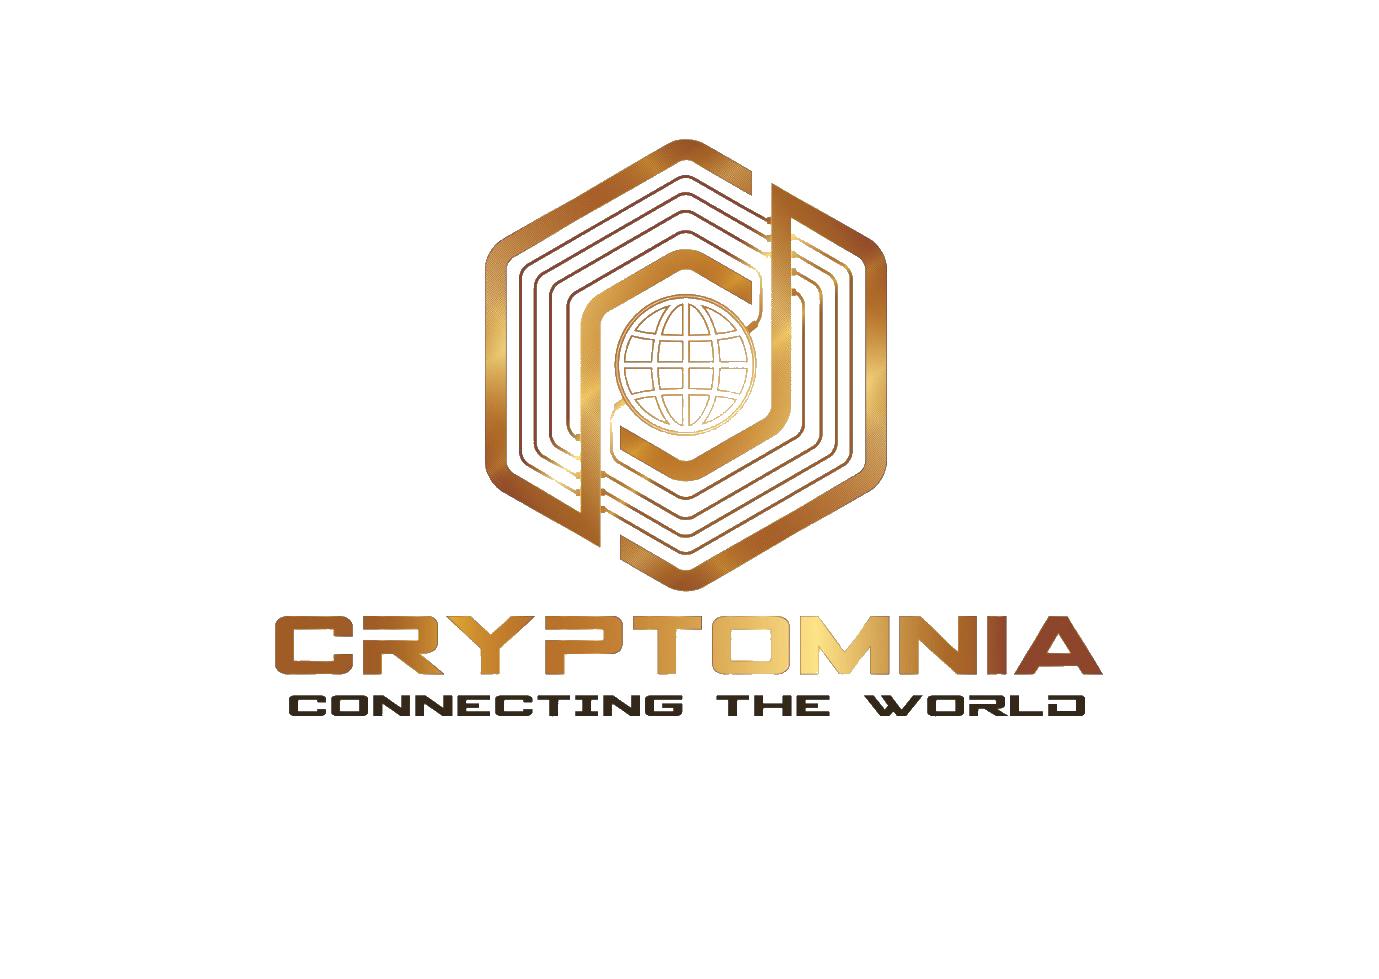 Cryptomnia